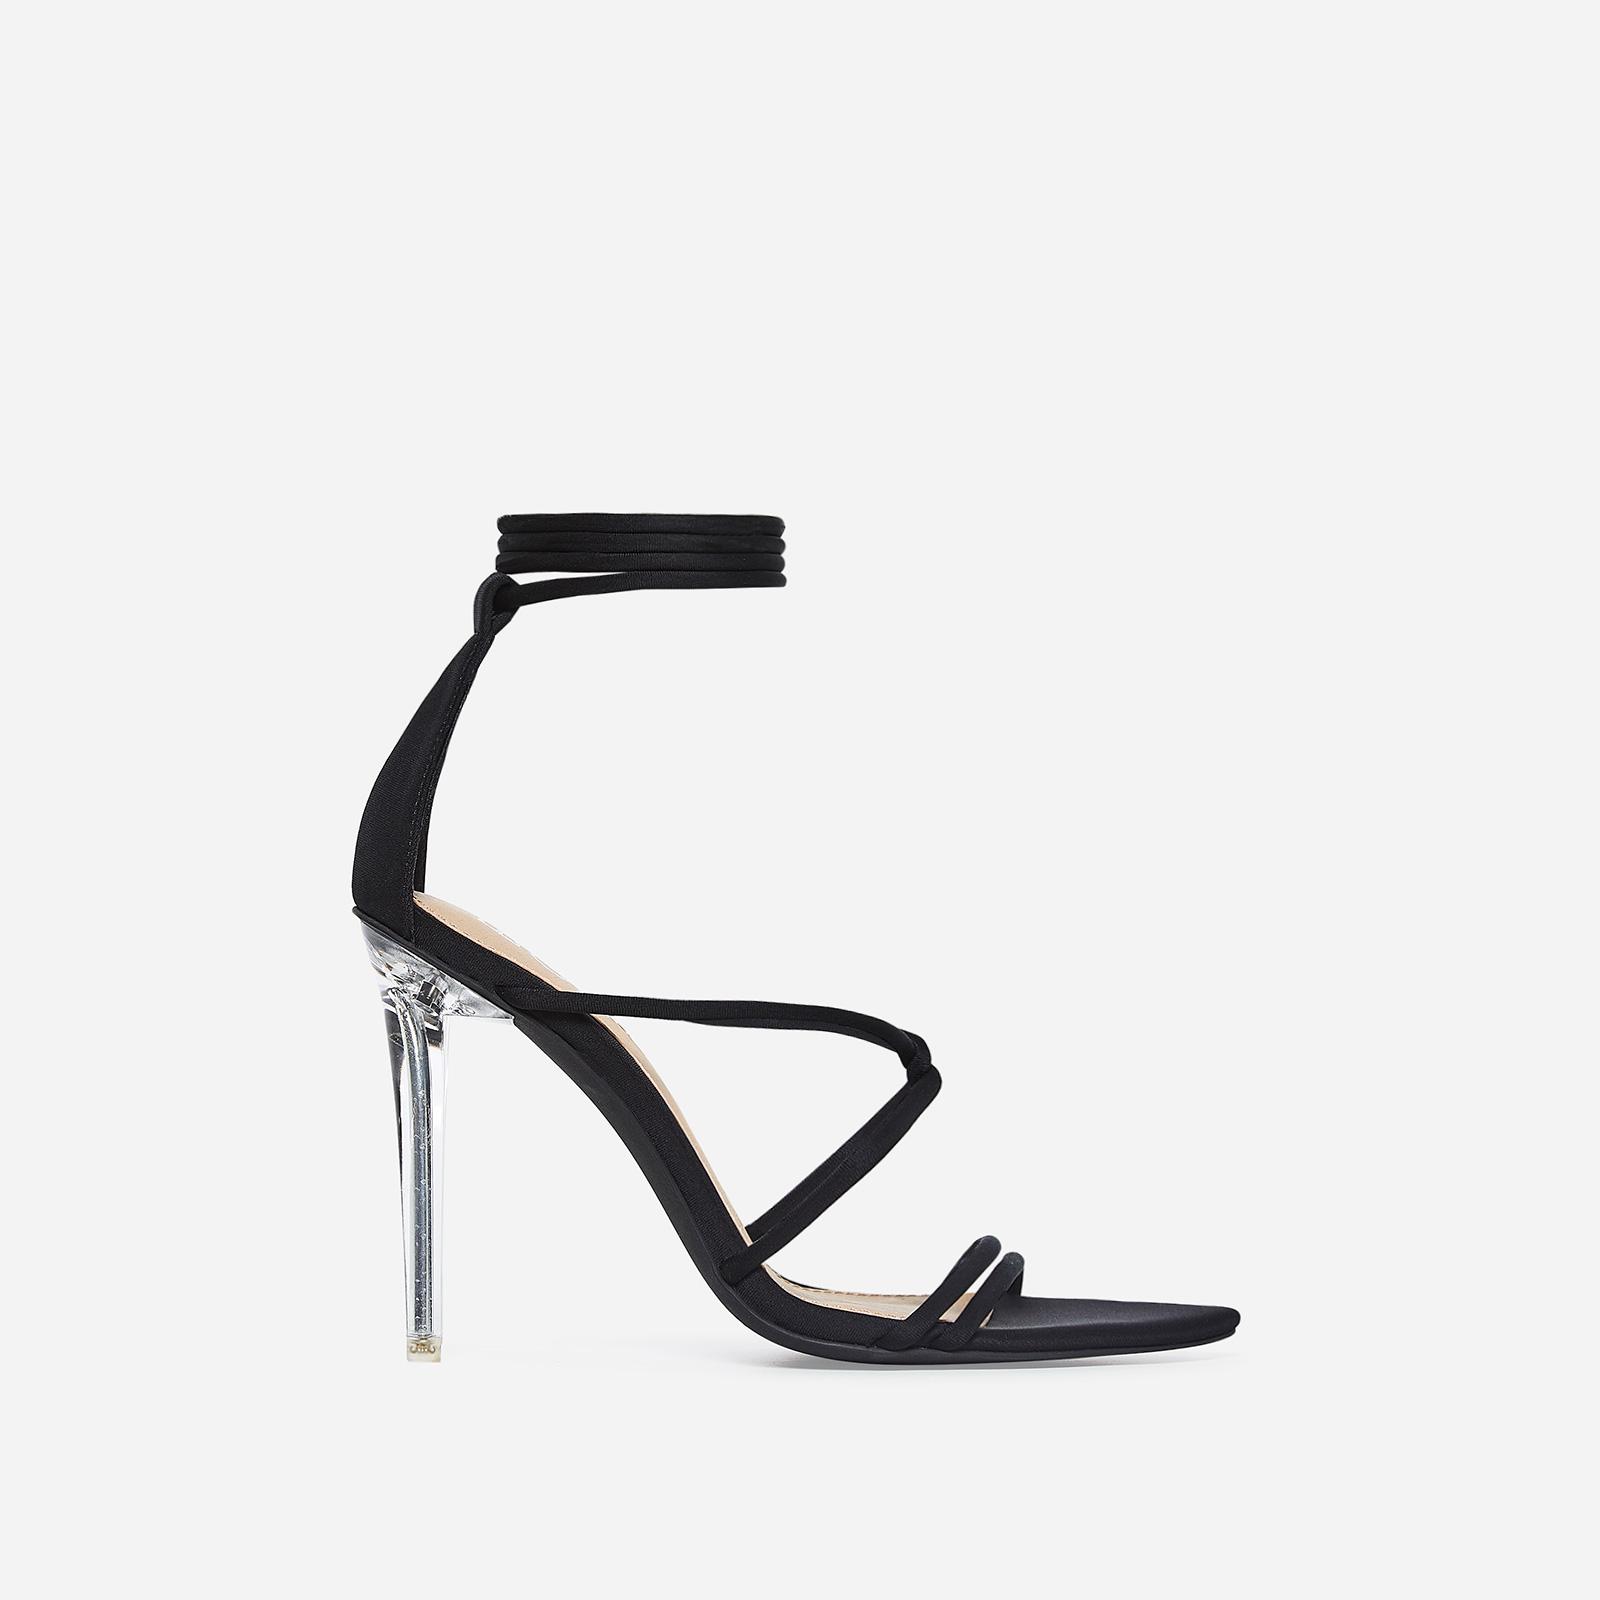 Gemma Lace Up Perspex Heel In Black Lycra